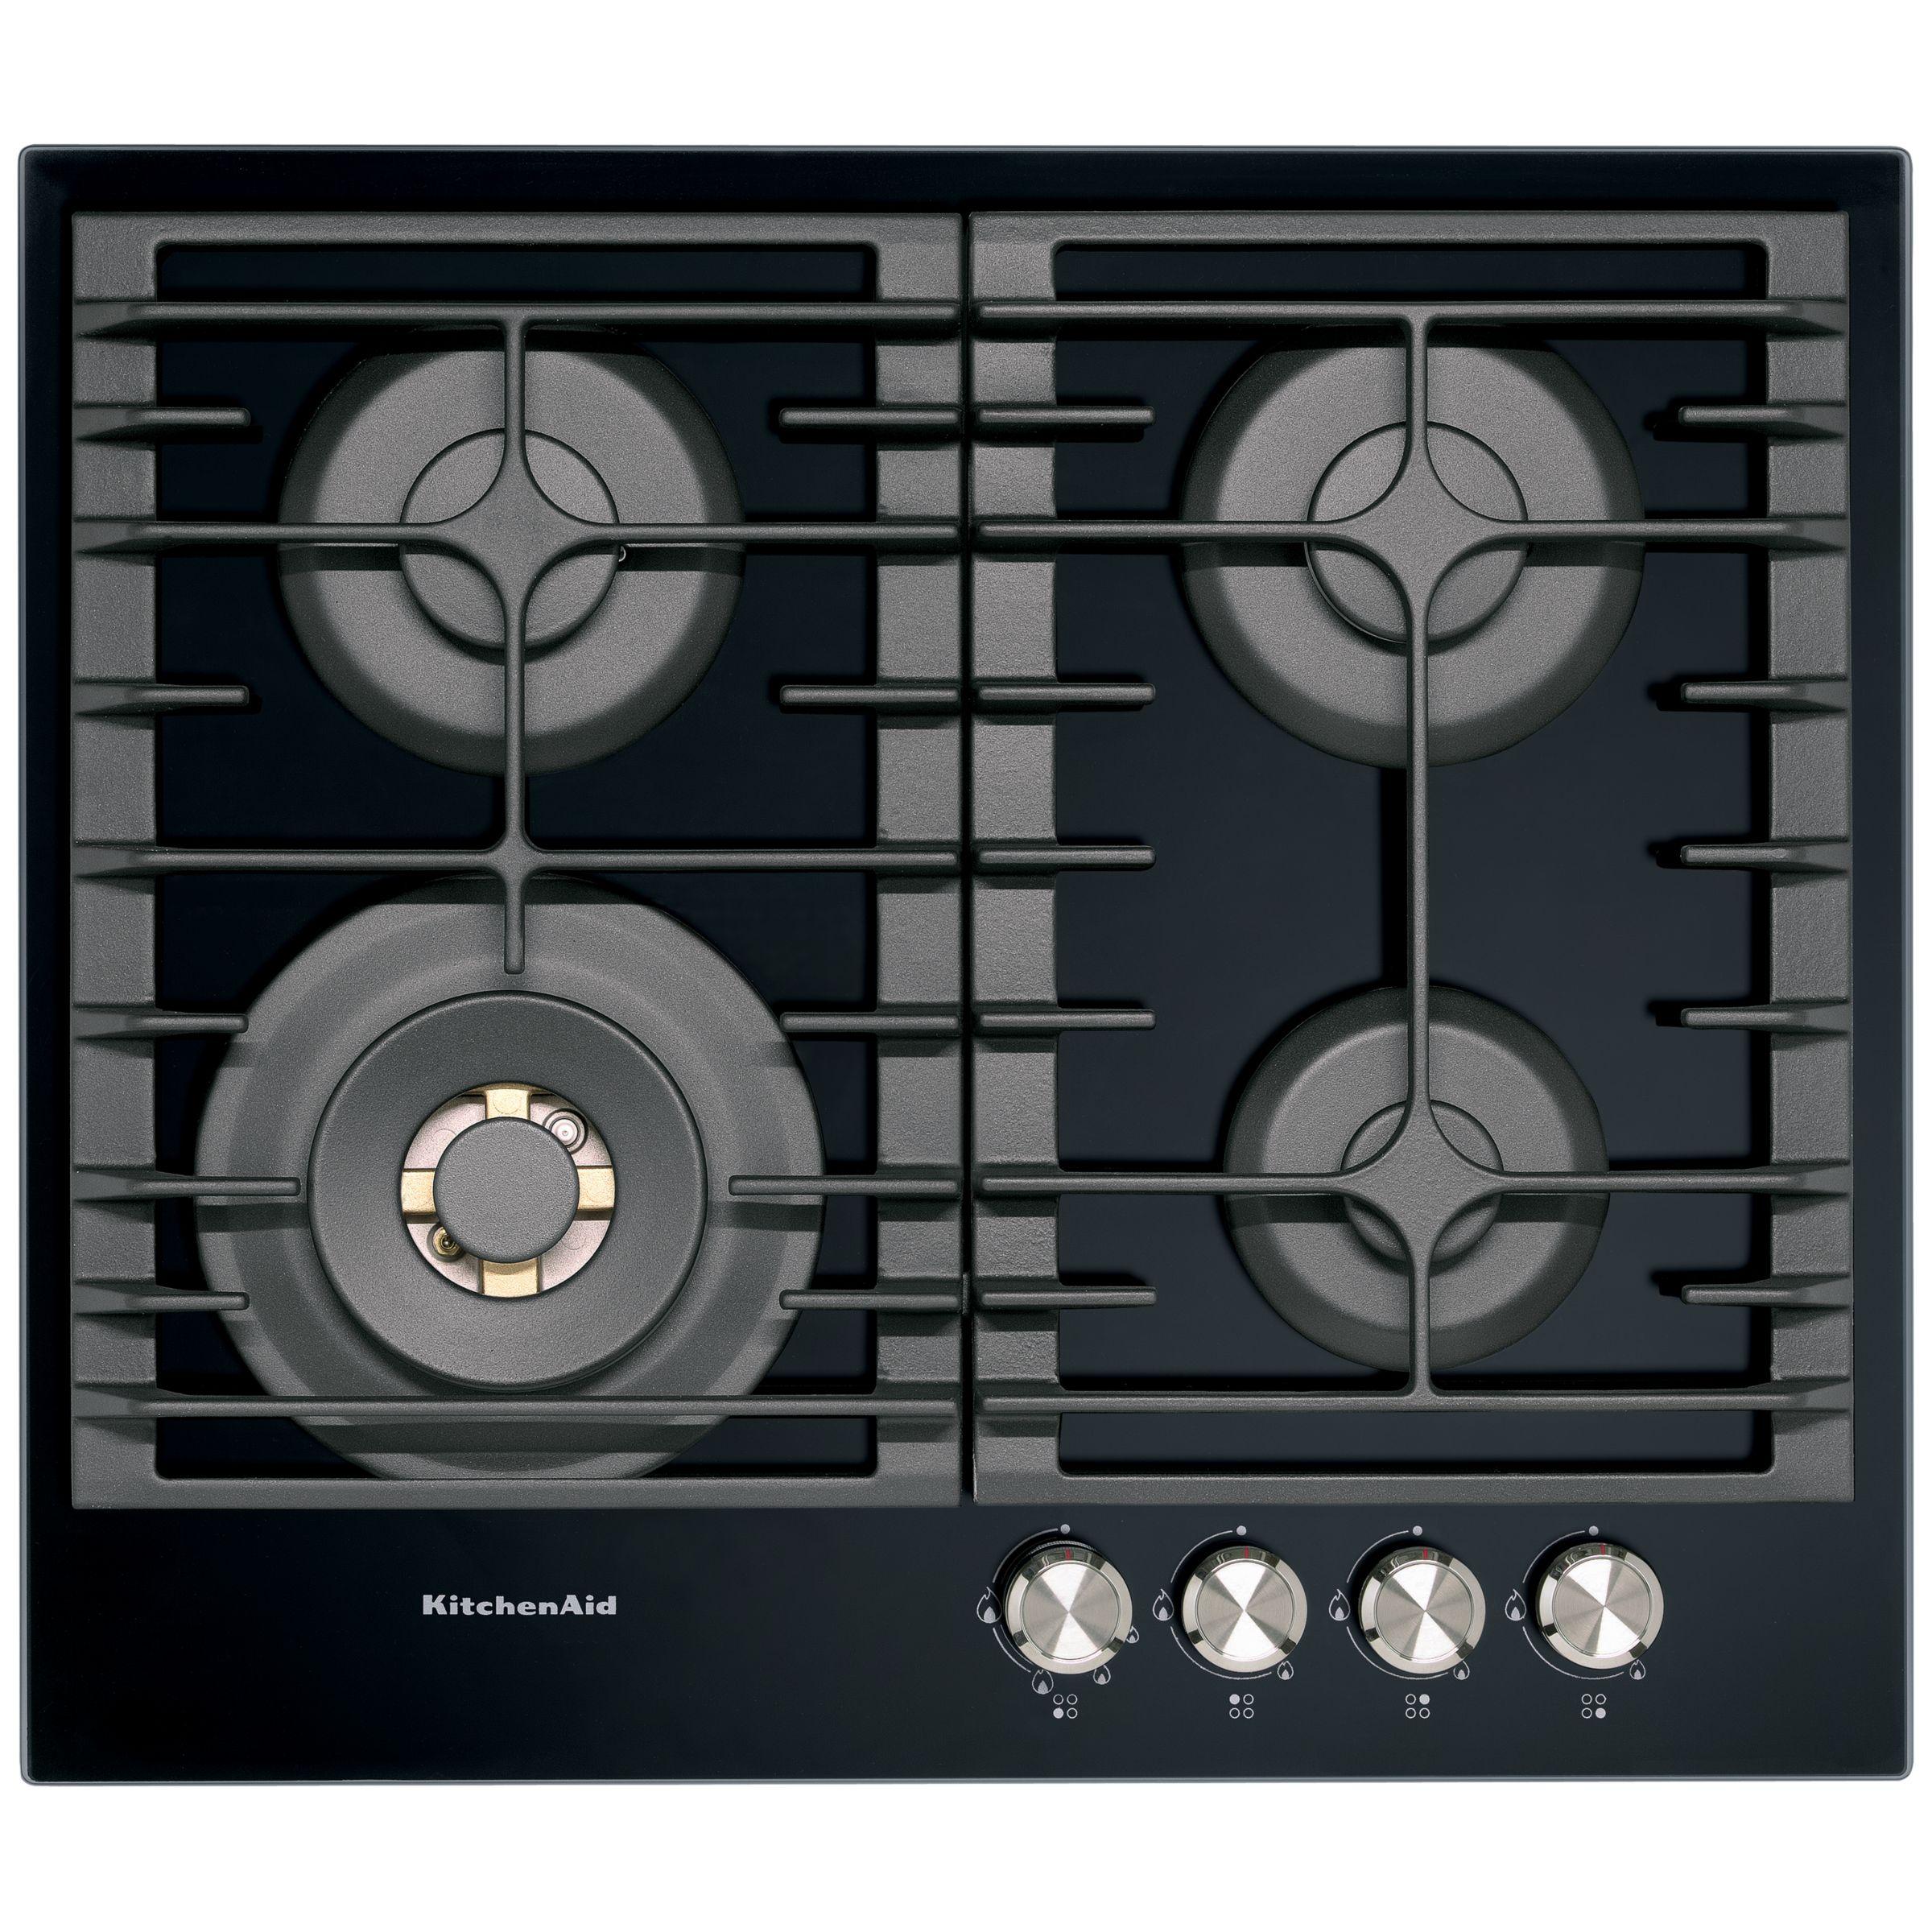 KitchenAid KitchenAid KHGD4 Integrated Gas Hob, Black